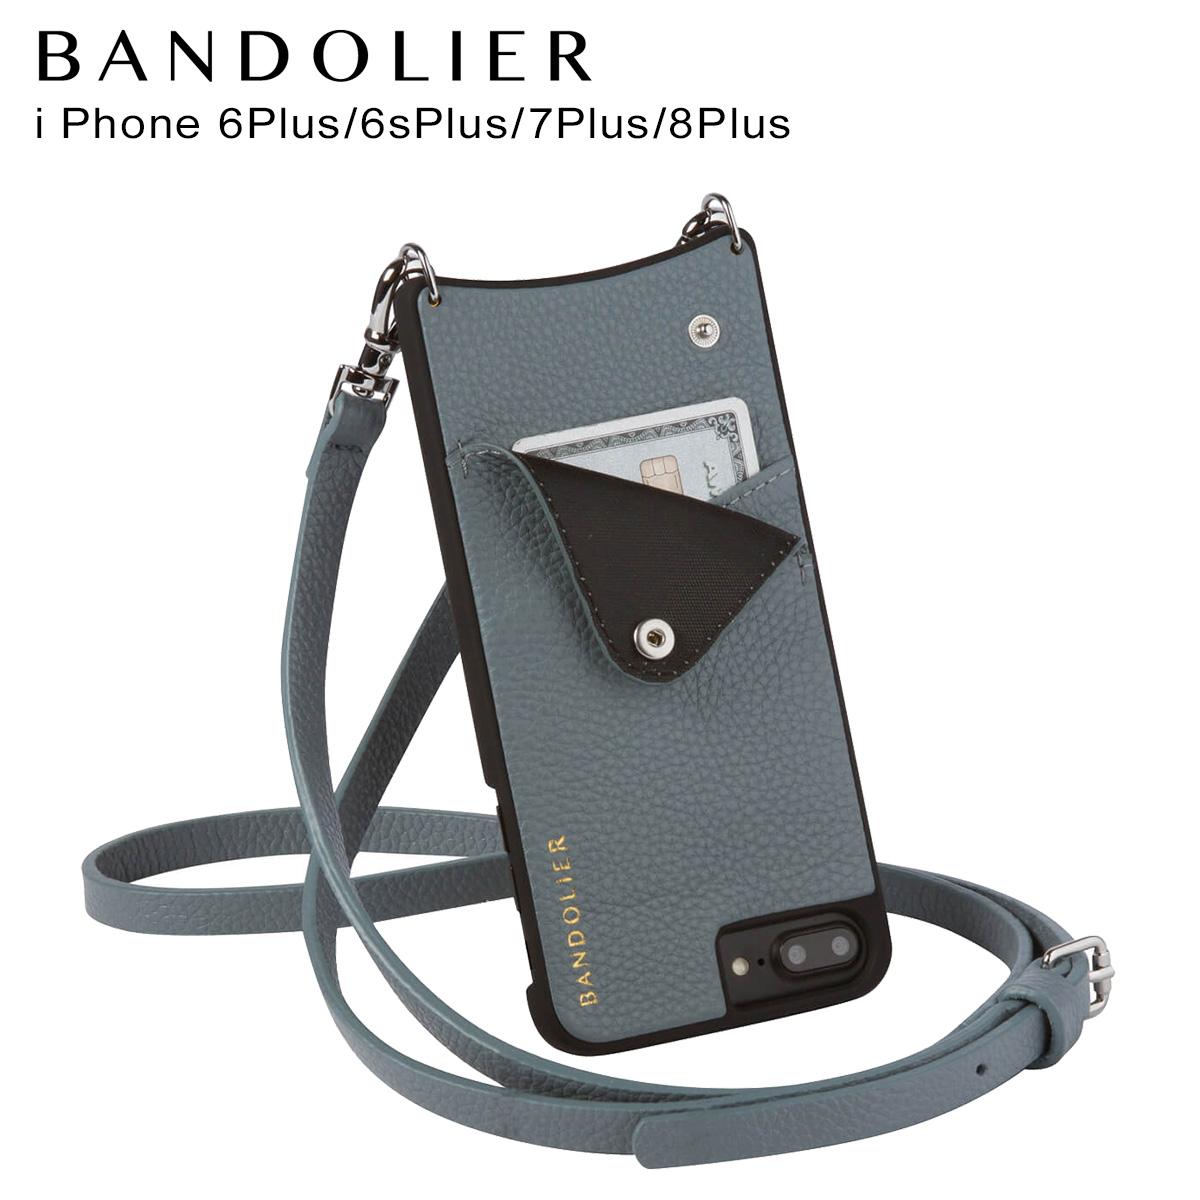 BANDOLIER バンドリヤー iPhone8Plus iPhone7Plus 6sPlus ケース スマホ アイフォン プラス EMMA STORM メンズ レディース